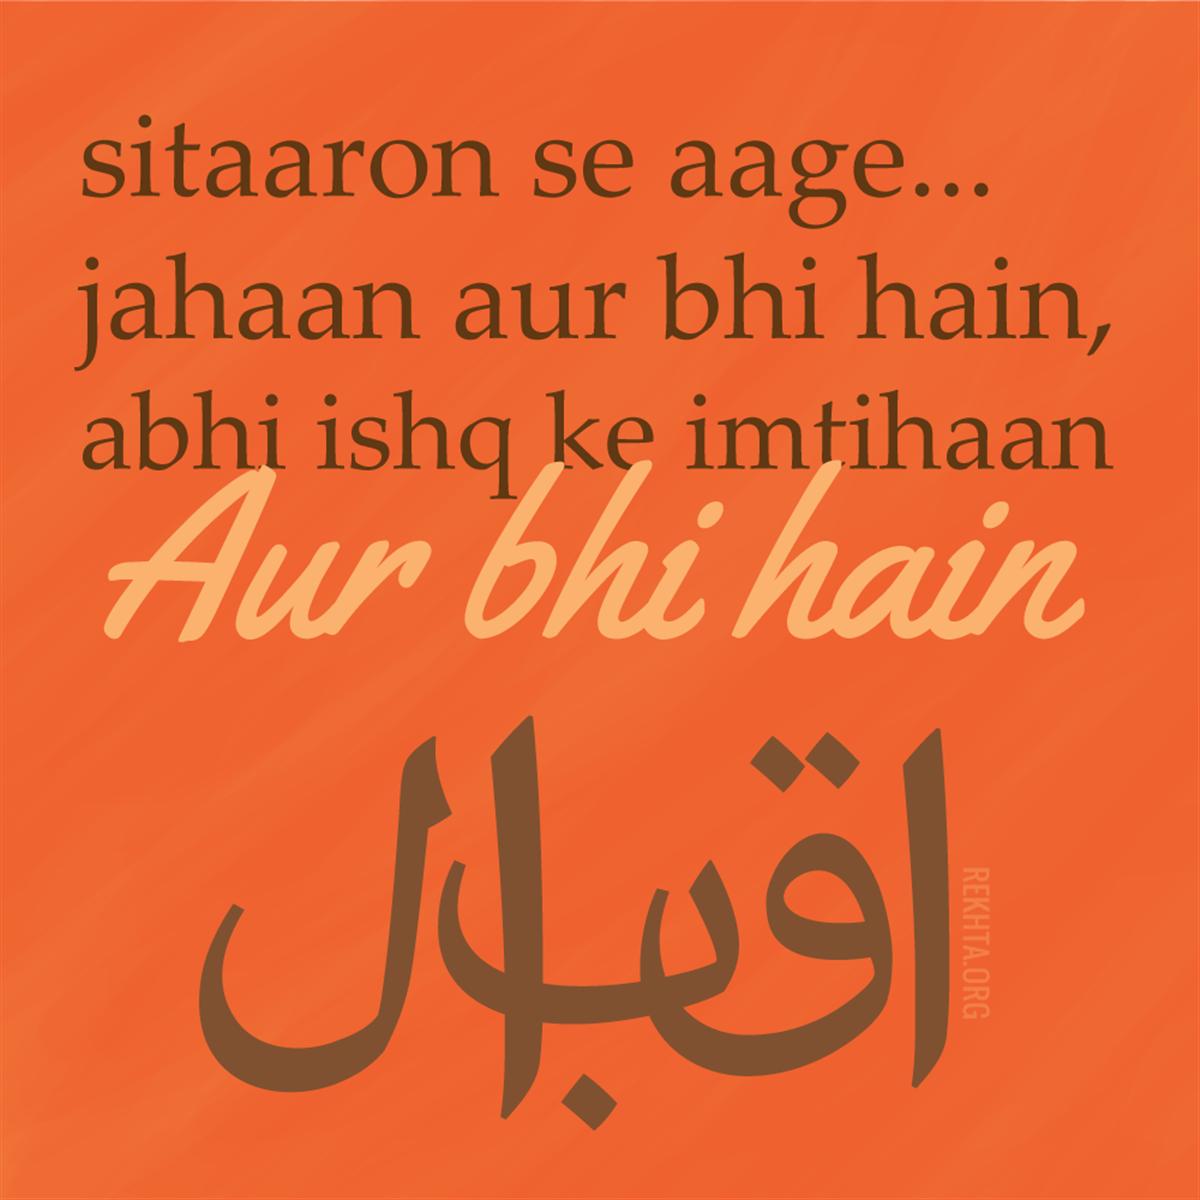 Allama Iqbal